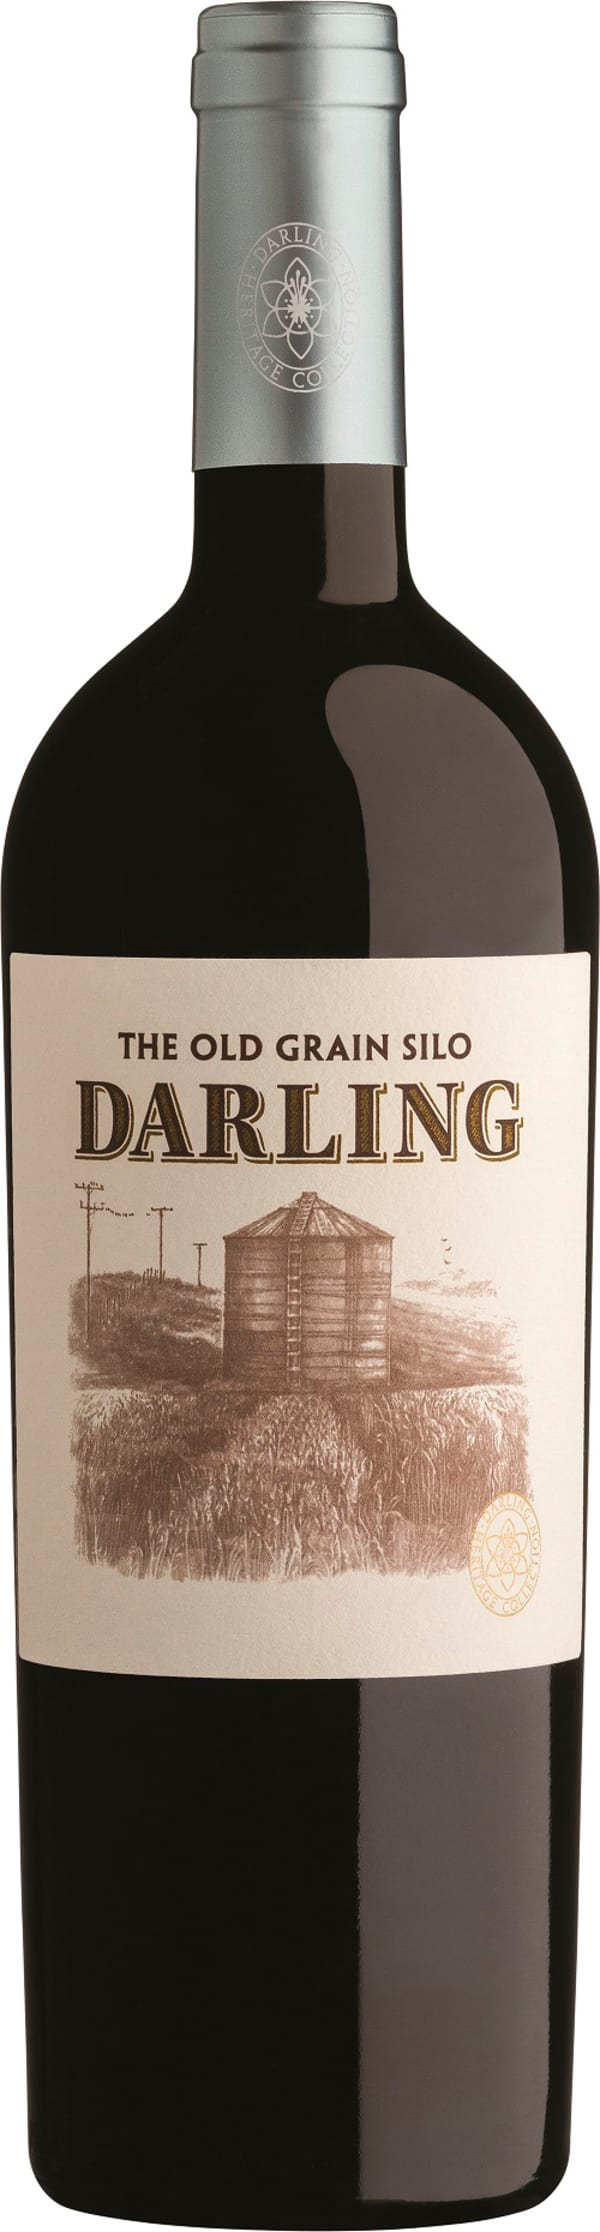 Darling Cellars The Old Grain Silo 2016